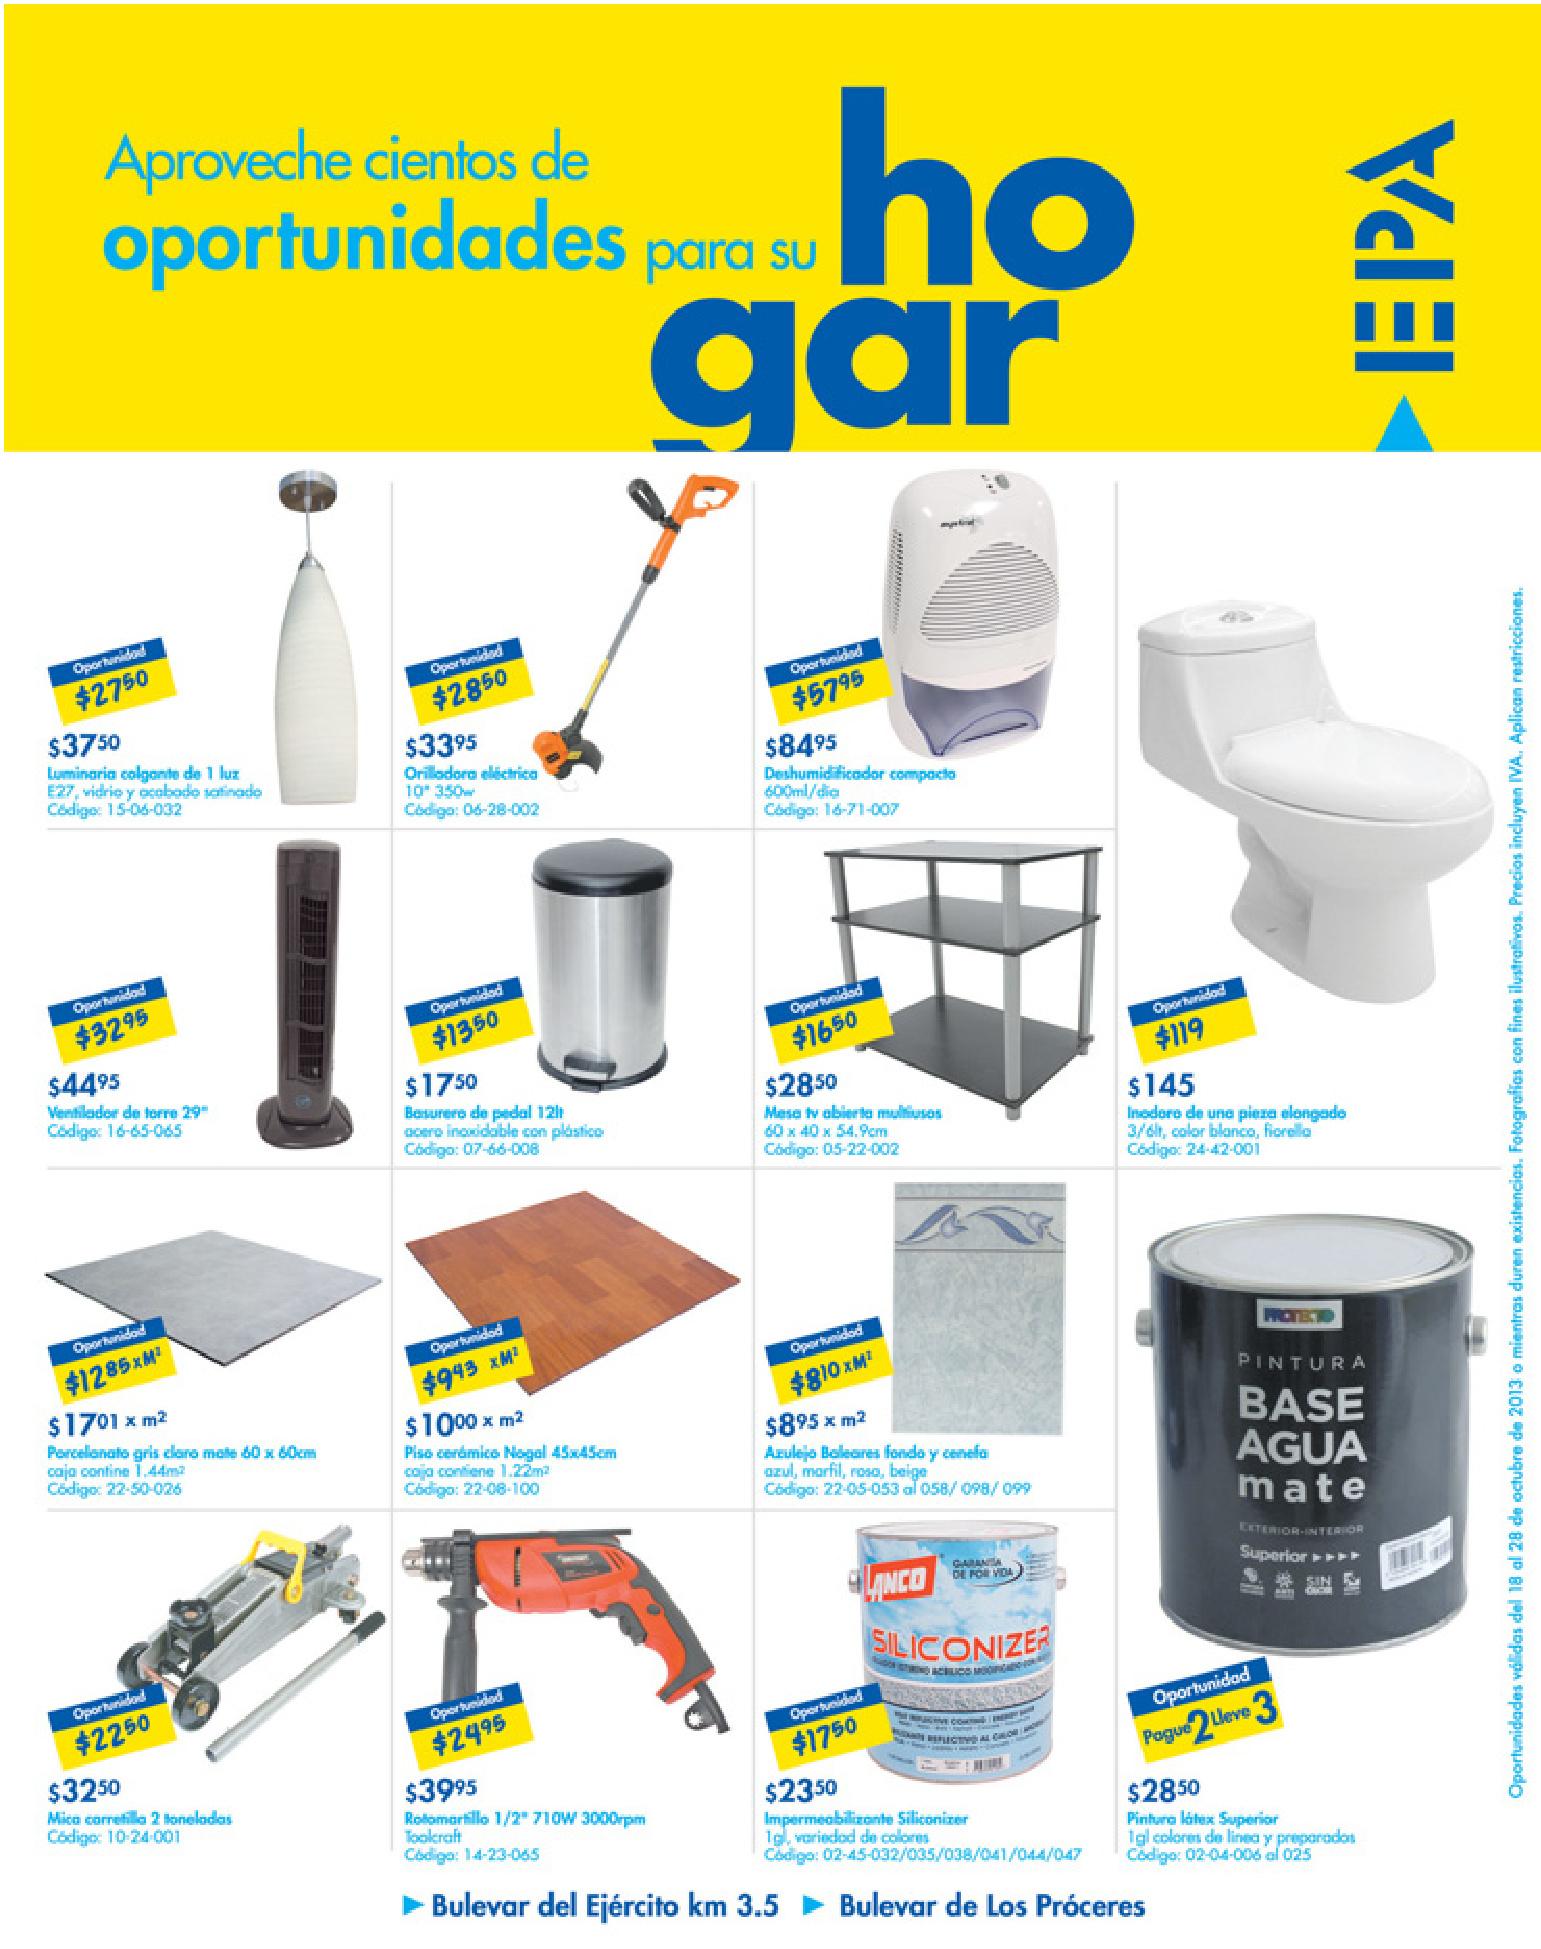 Ofertas hogar excellent crack hogar ofertas y folletos for Mueble zapatero hipercor